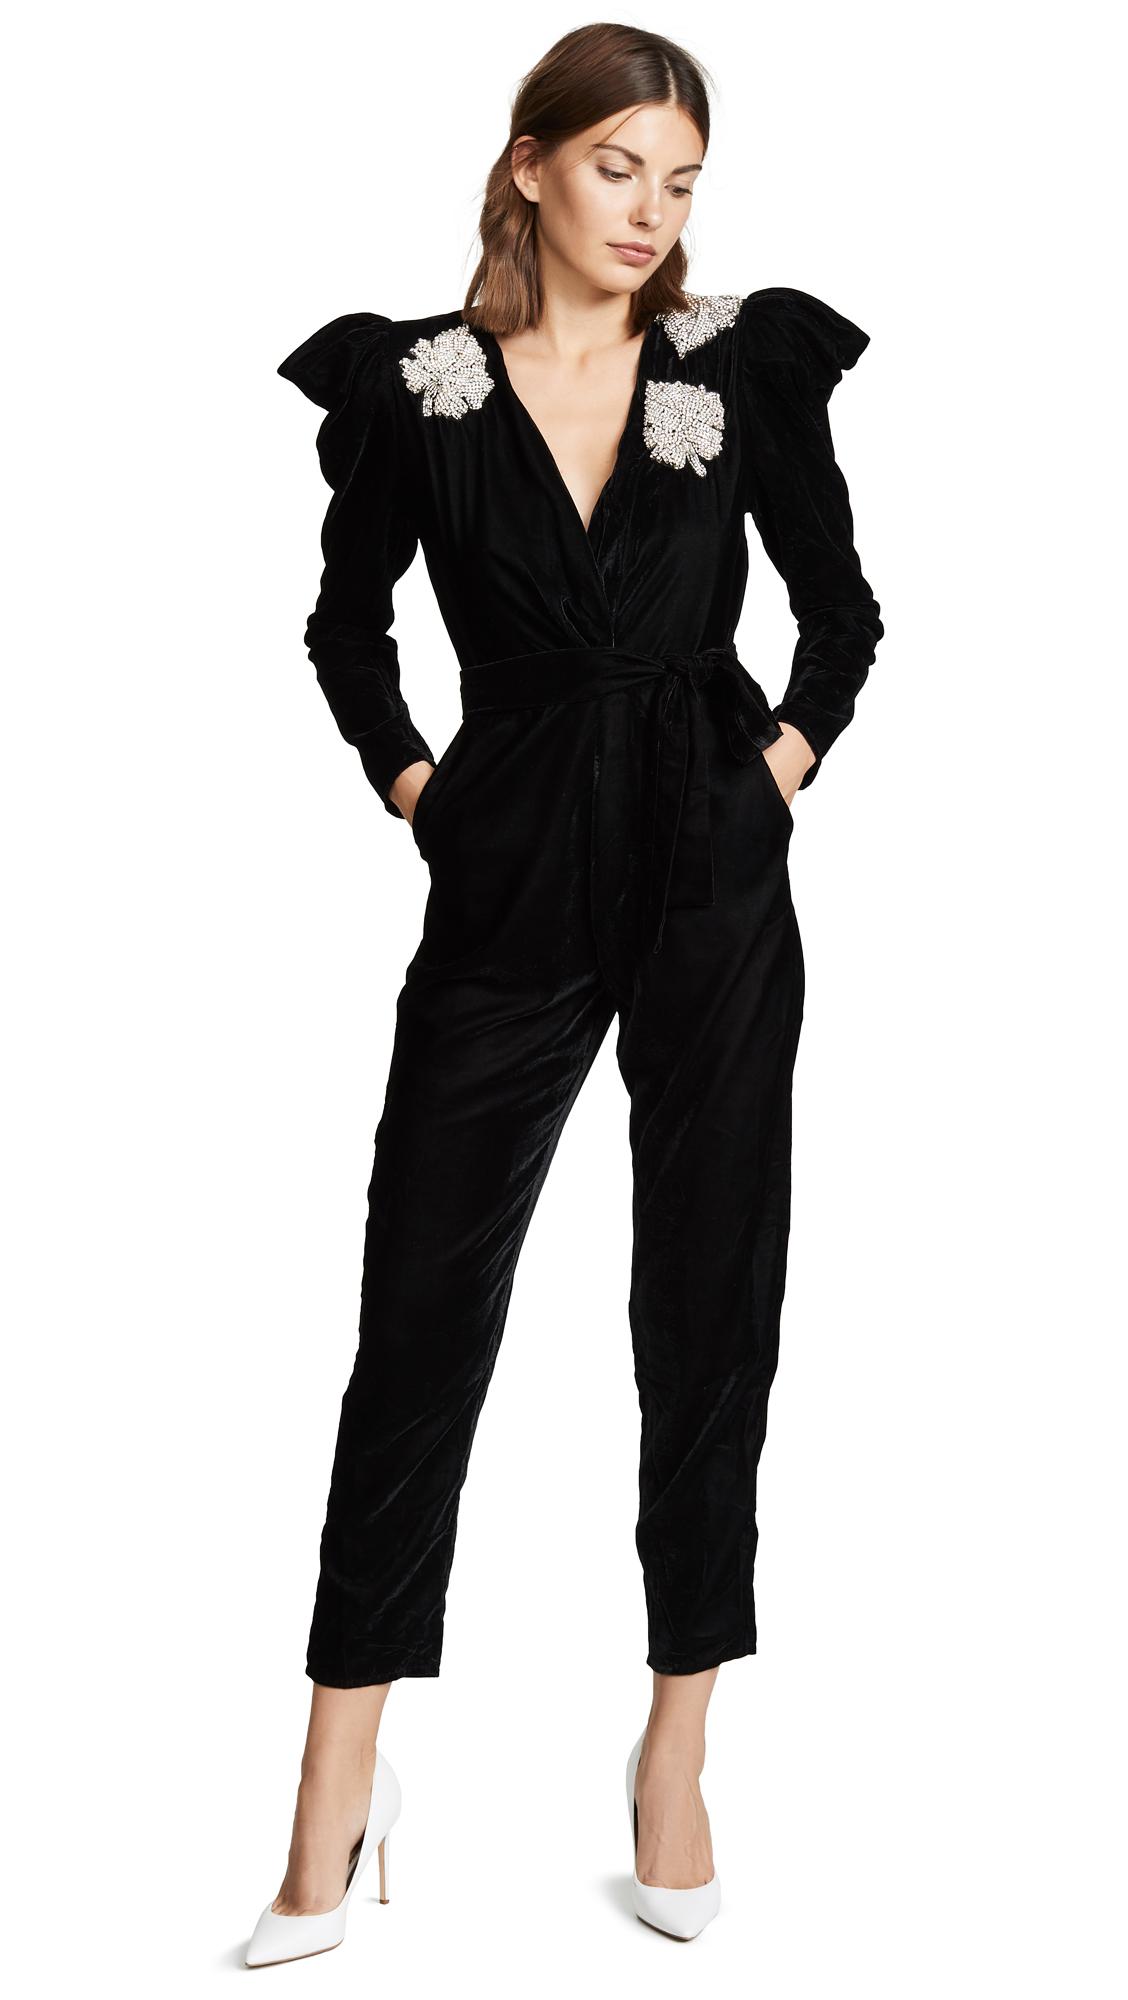 9a16fc639610 Velvet Rompers - Buy Best Velvet Rompers from Fashion Influencers ...